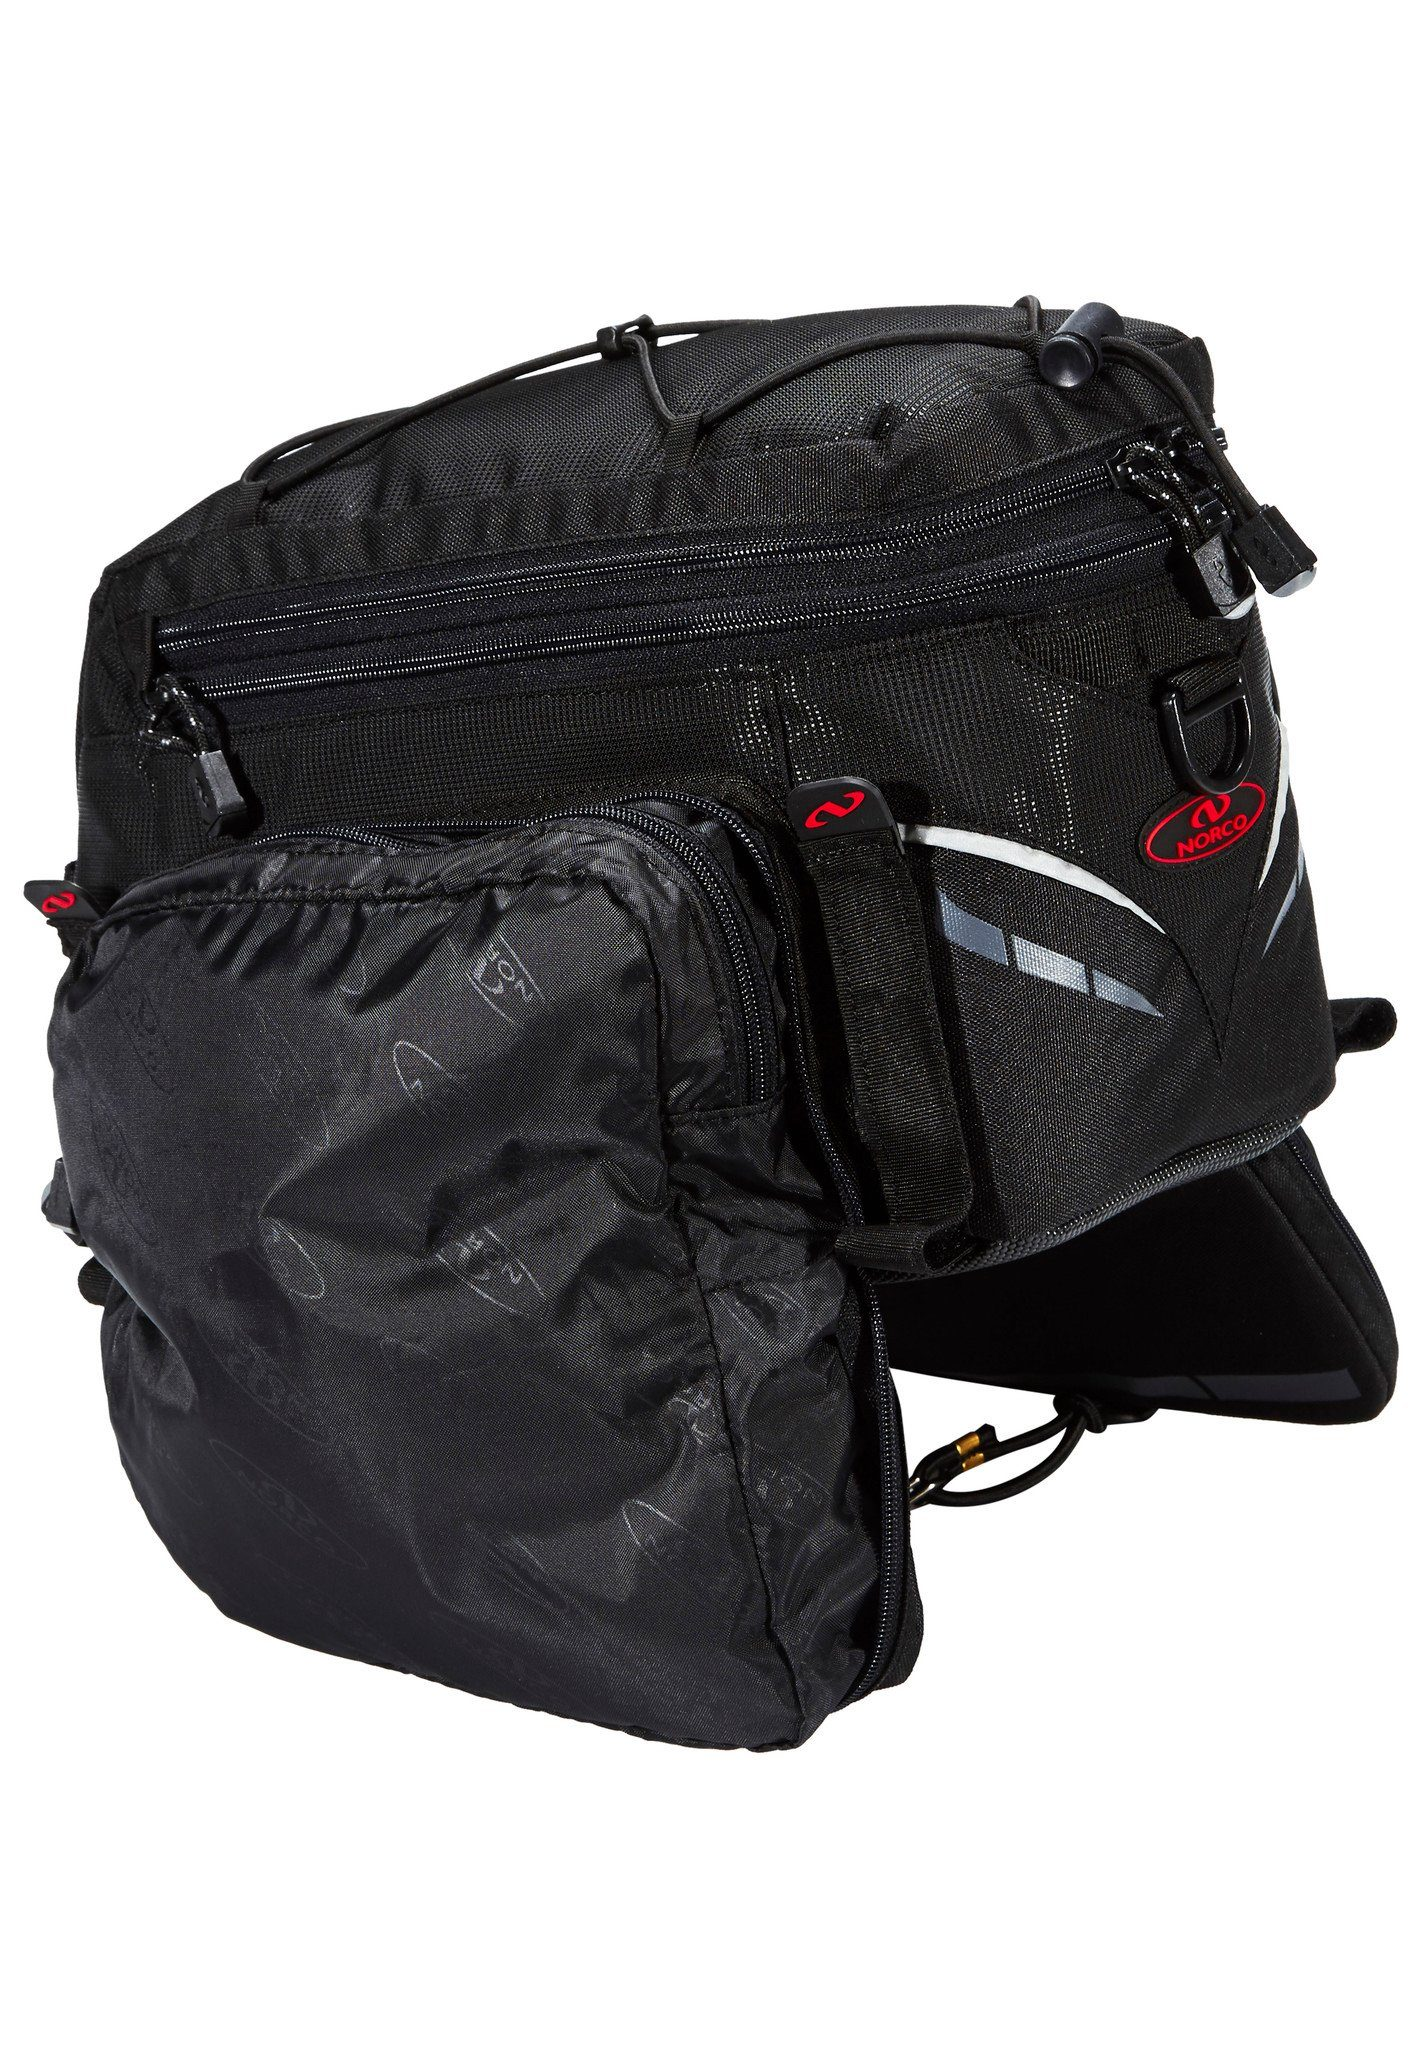 Norco Gepäckträgertasche »Canmore Gepäckträgertasche«